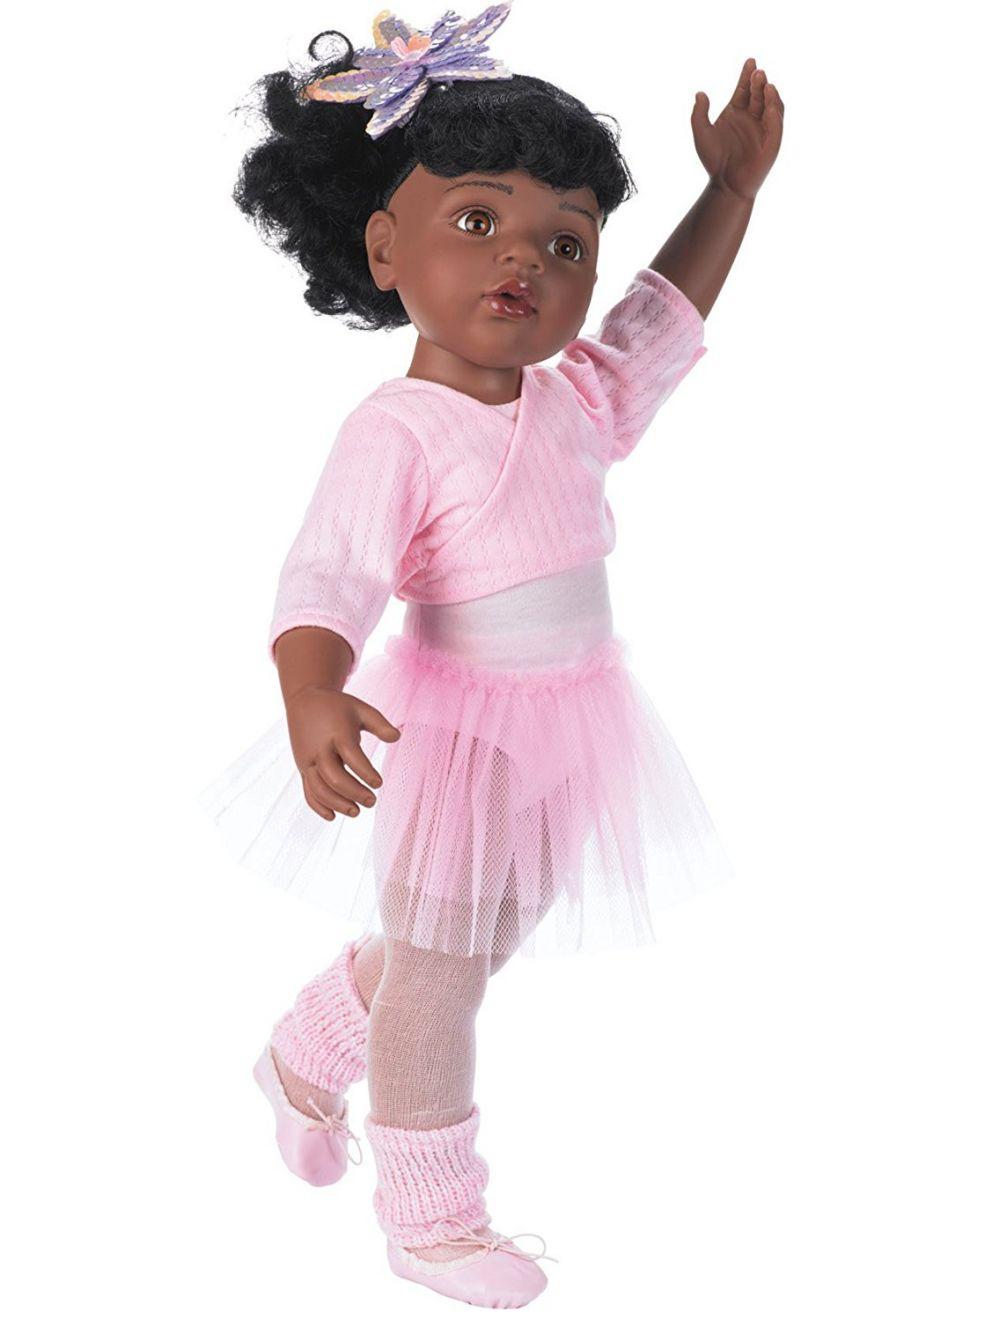 Hannah balletitund afroameeriklanna 50 cm Götz